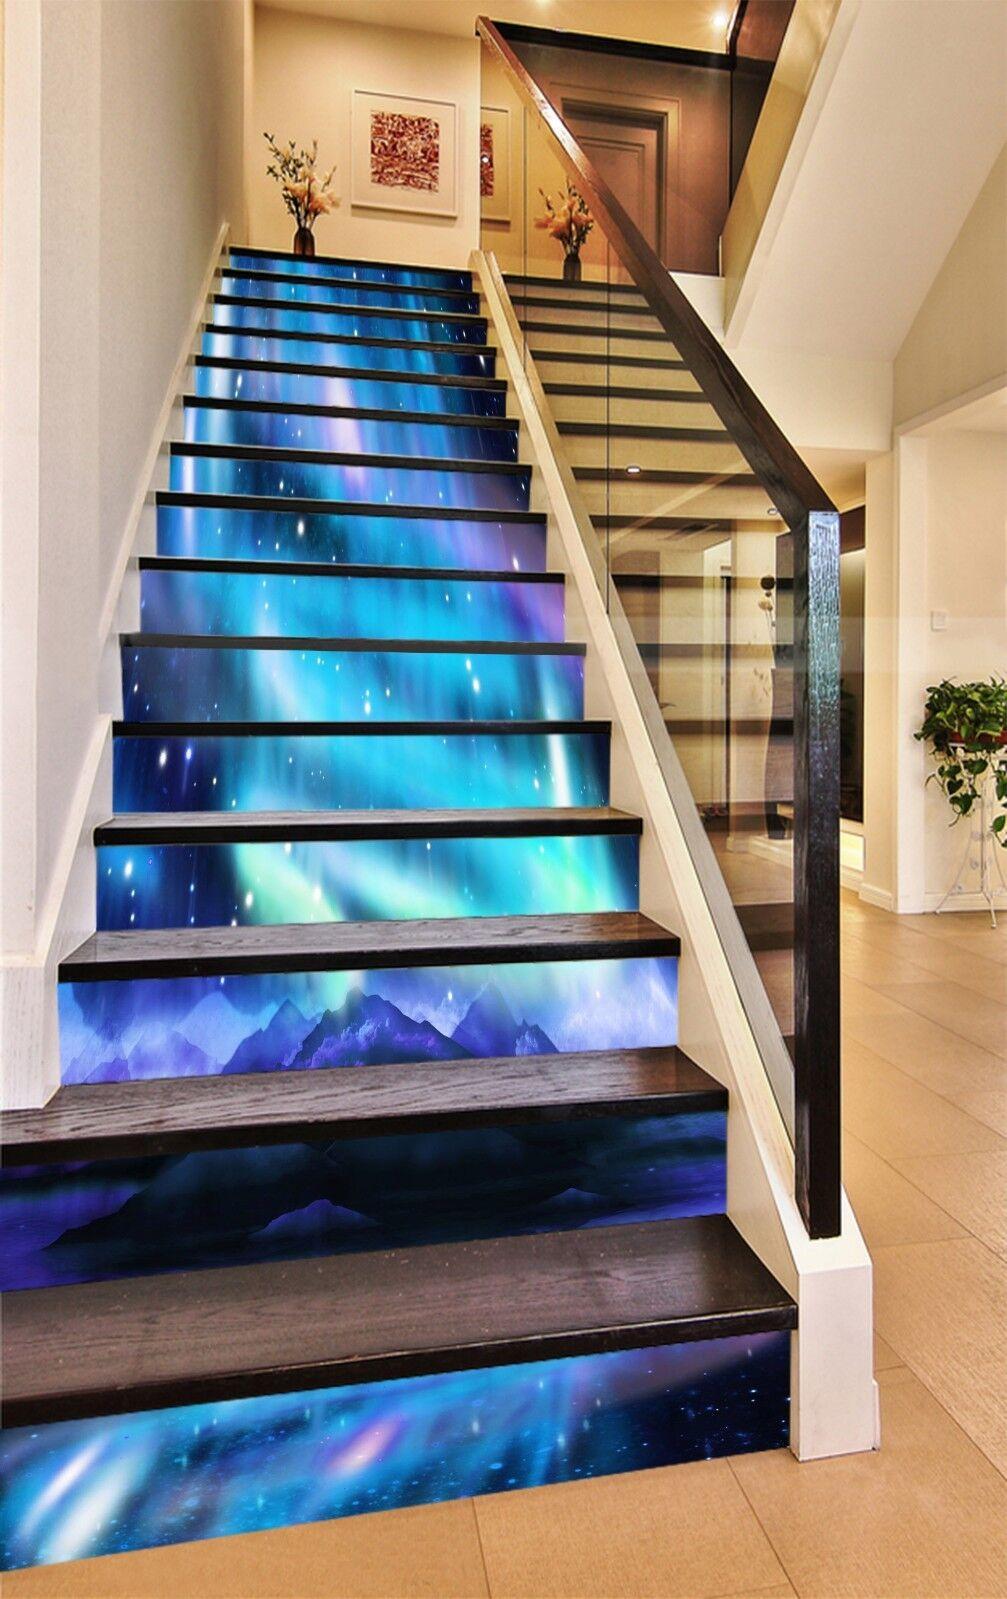 3D bluee Beam 52 Stair Risers Decoration Photo Mural Vinyl Decal Wallpaper UK